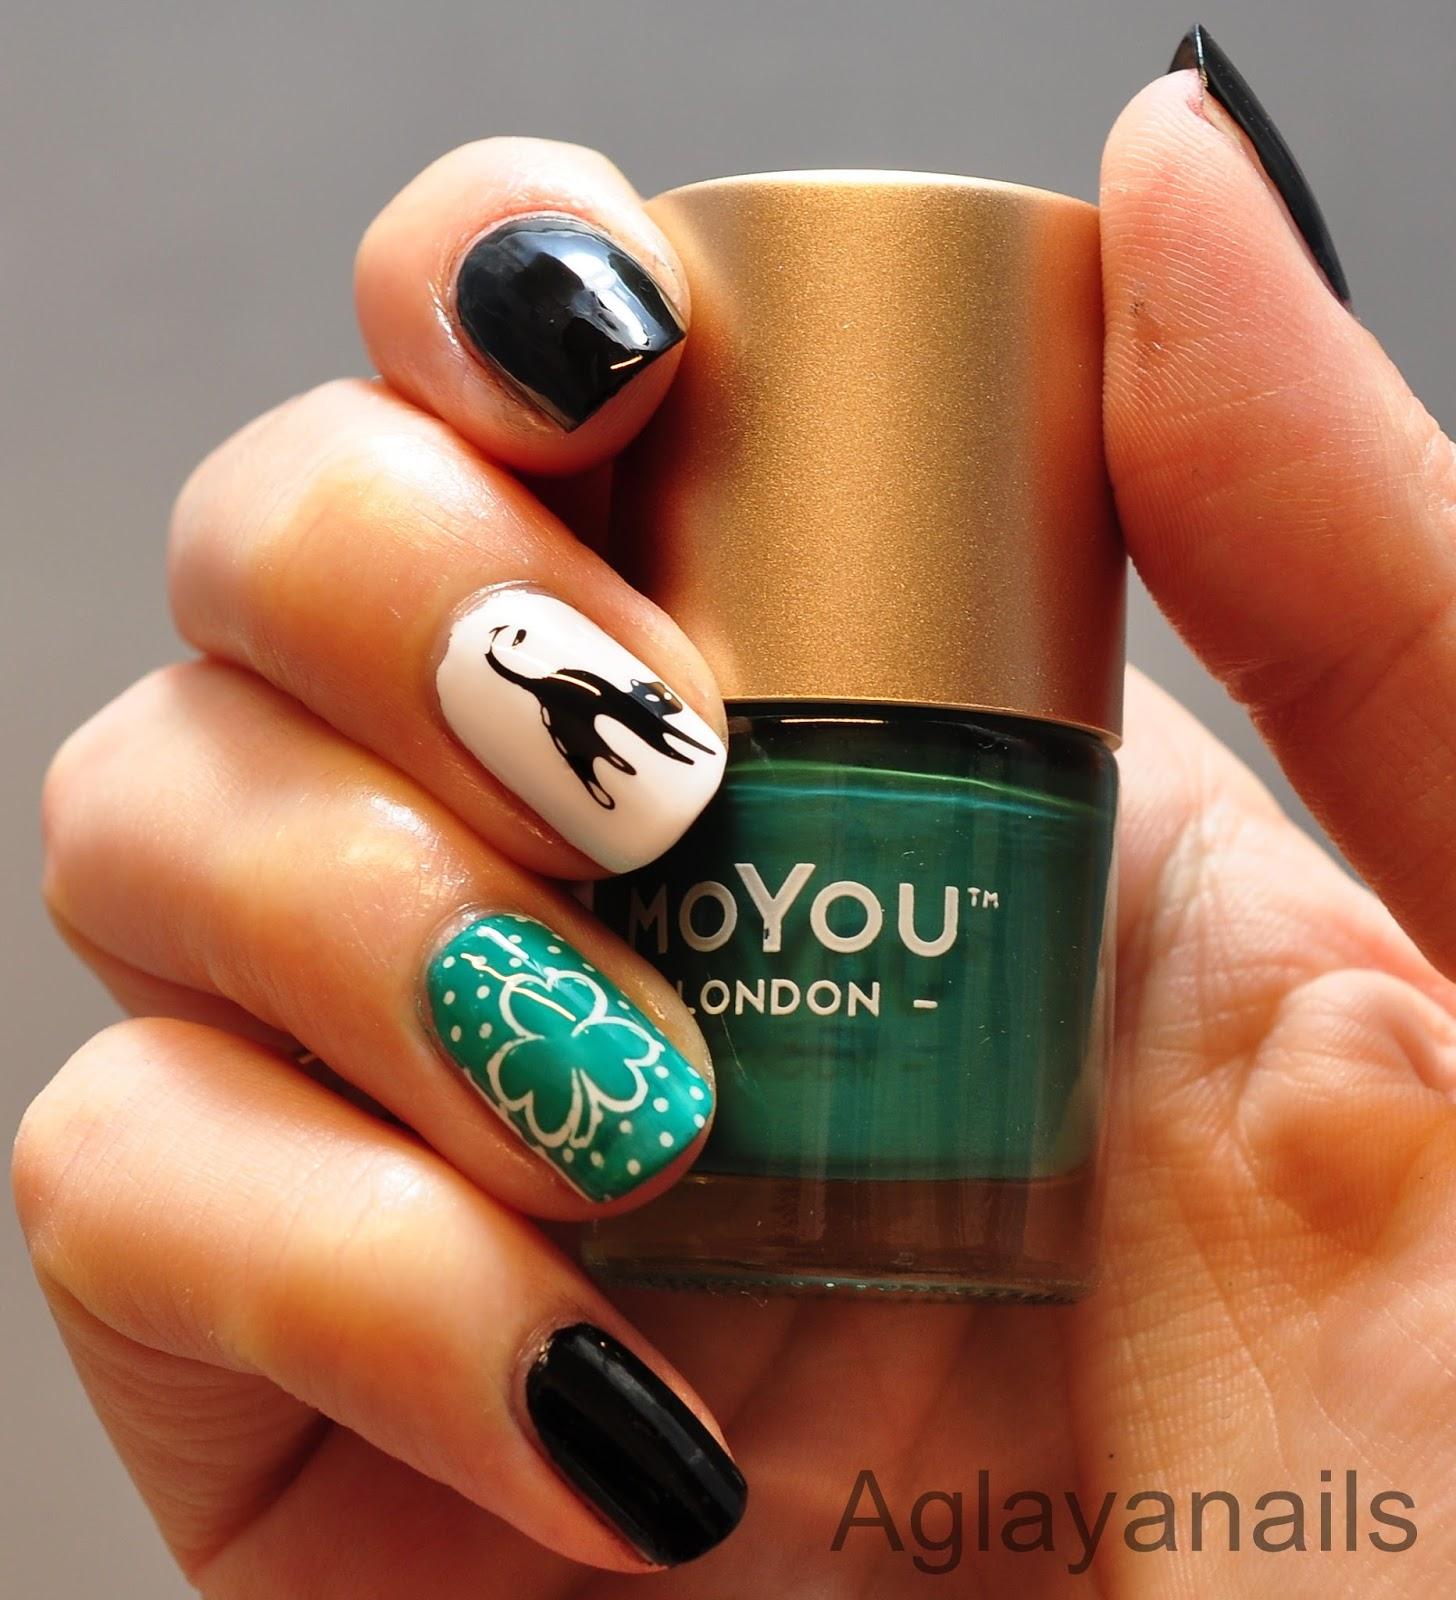 Aglayanails: 26 Great Nail Art Ideas: Friday the 13th